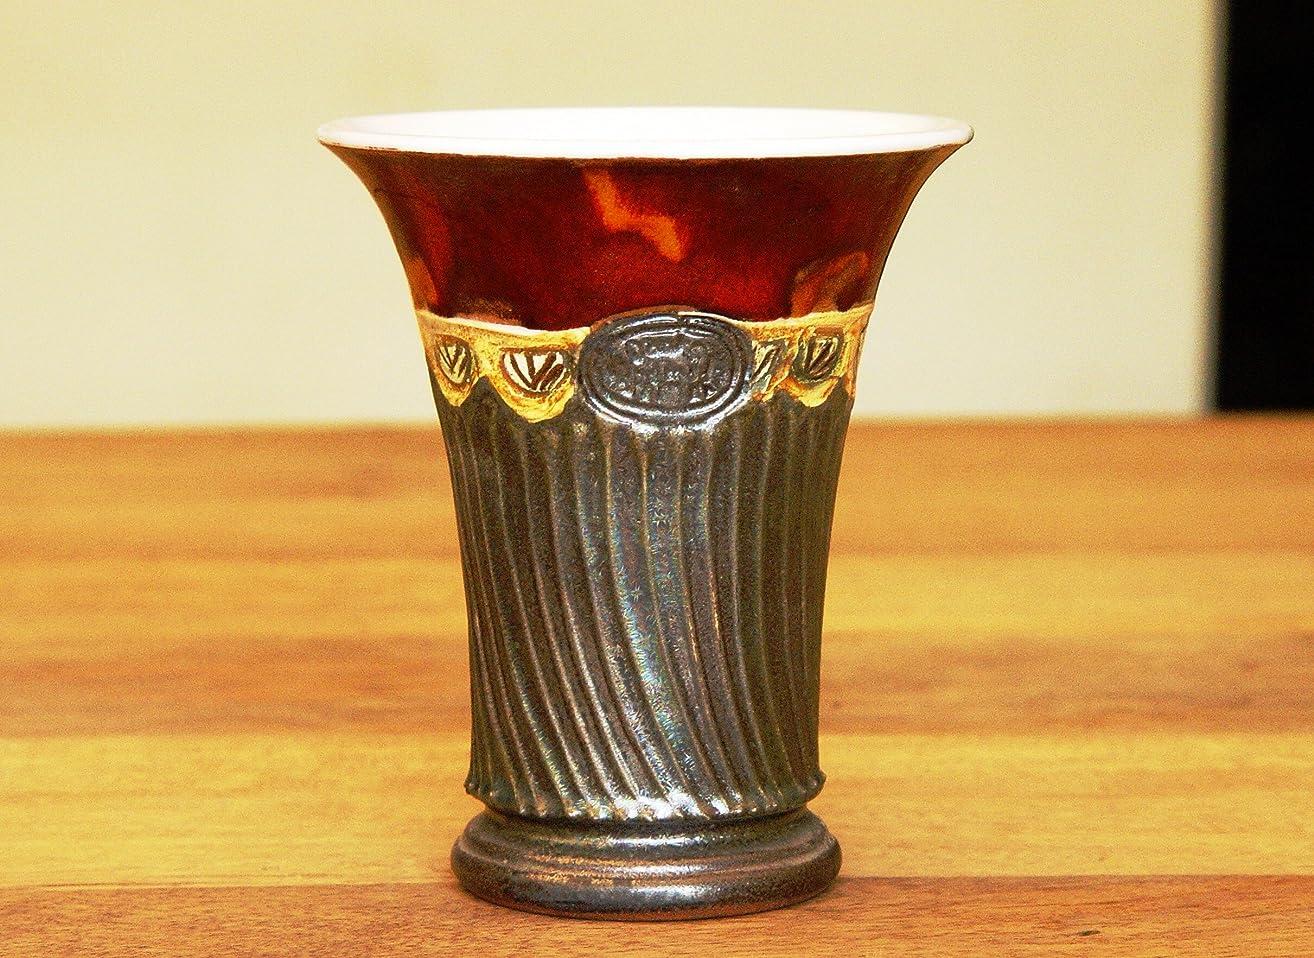 Ceramics and Pottery Wine Mug. Tumbler. Wine Goblet, Clay Mug, Red mug, Pottery Wine Set, Unique Mugs, Pottery handmade